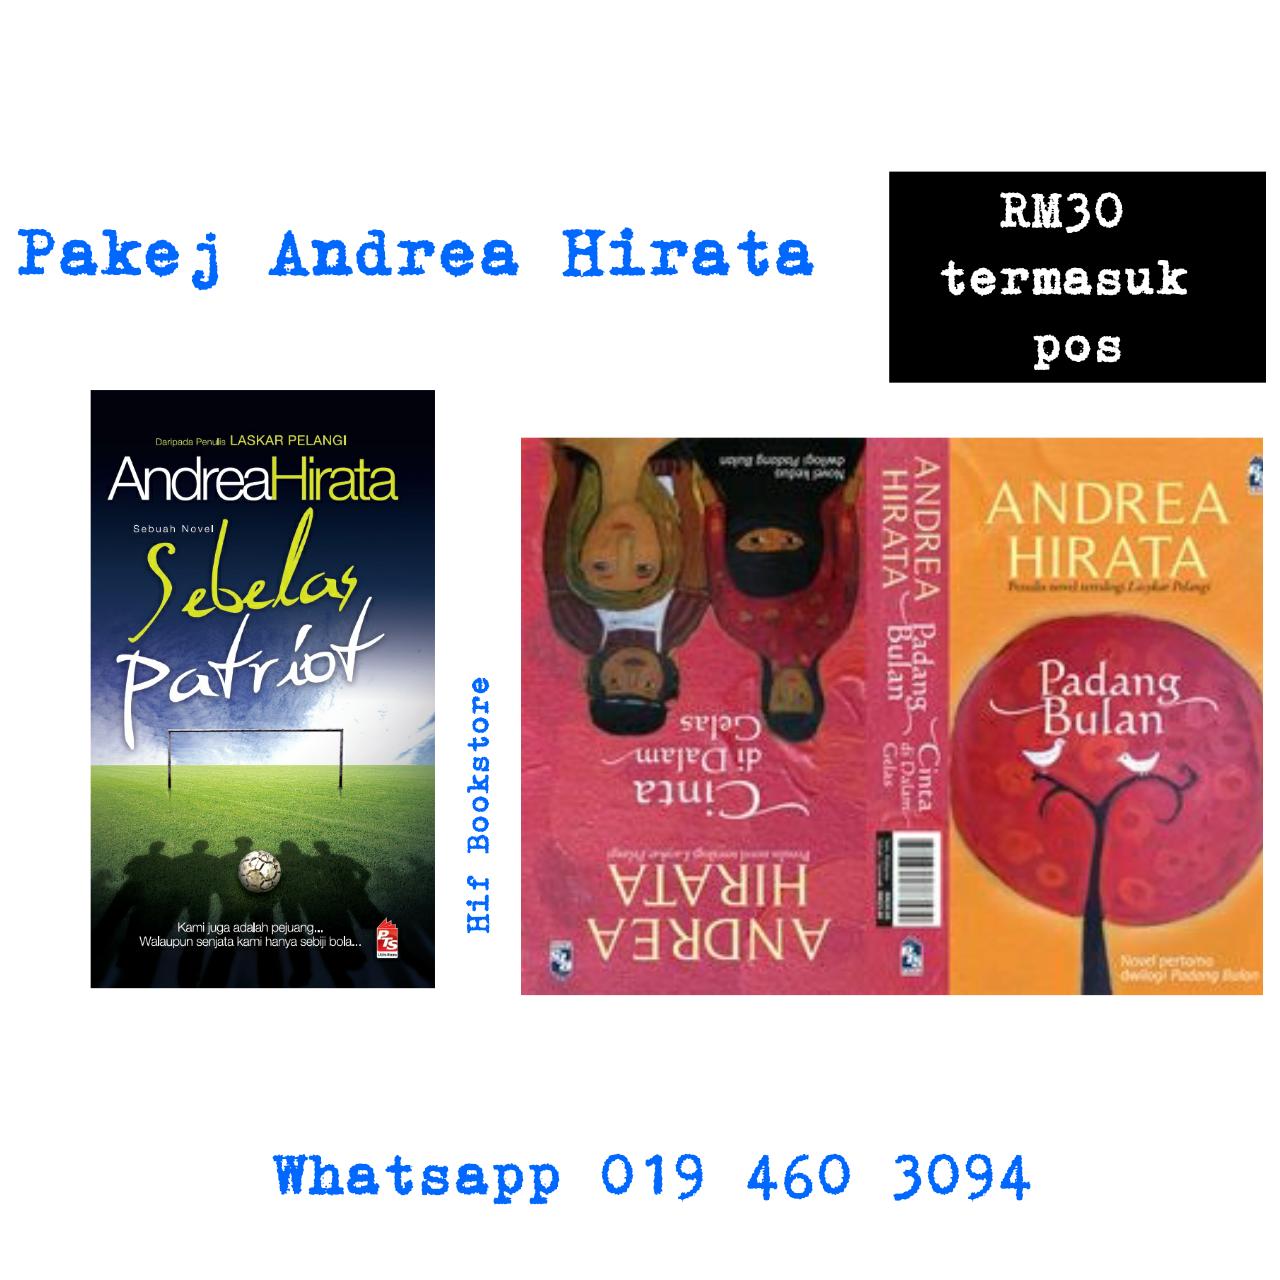 Pakej Andrea Hirata